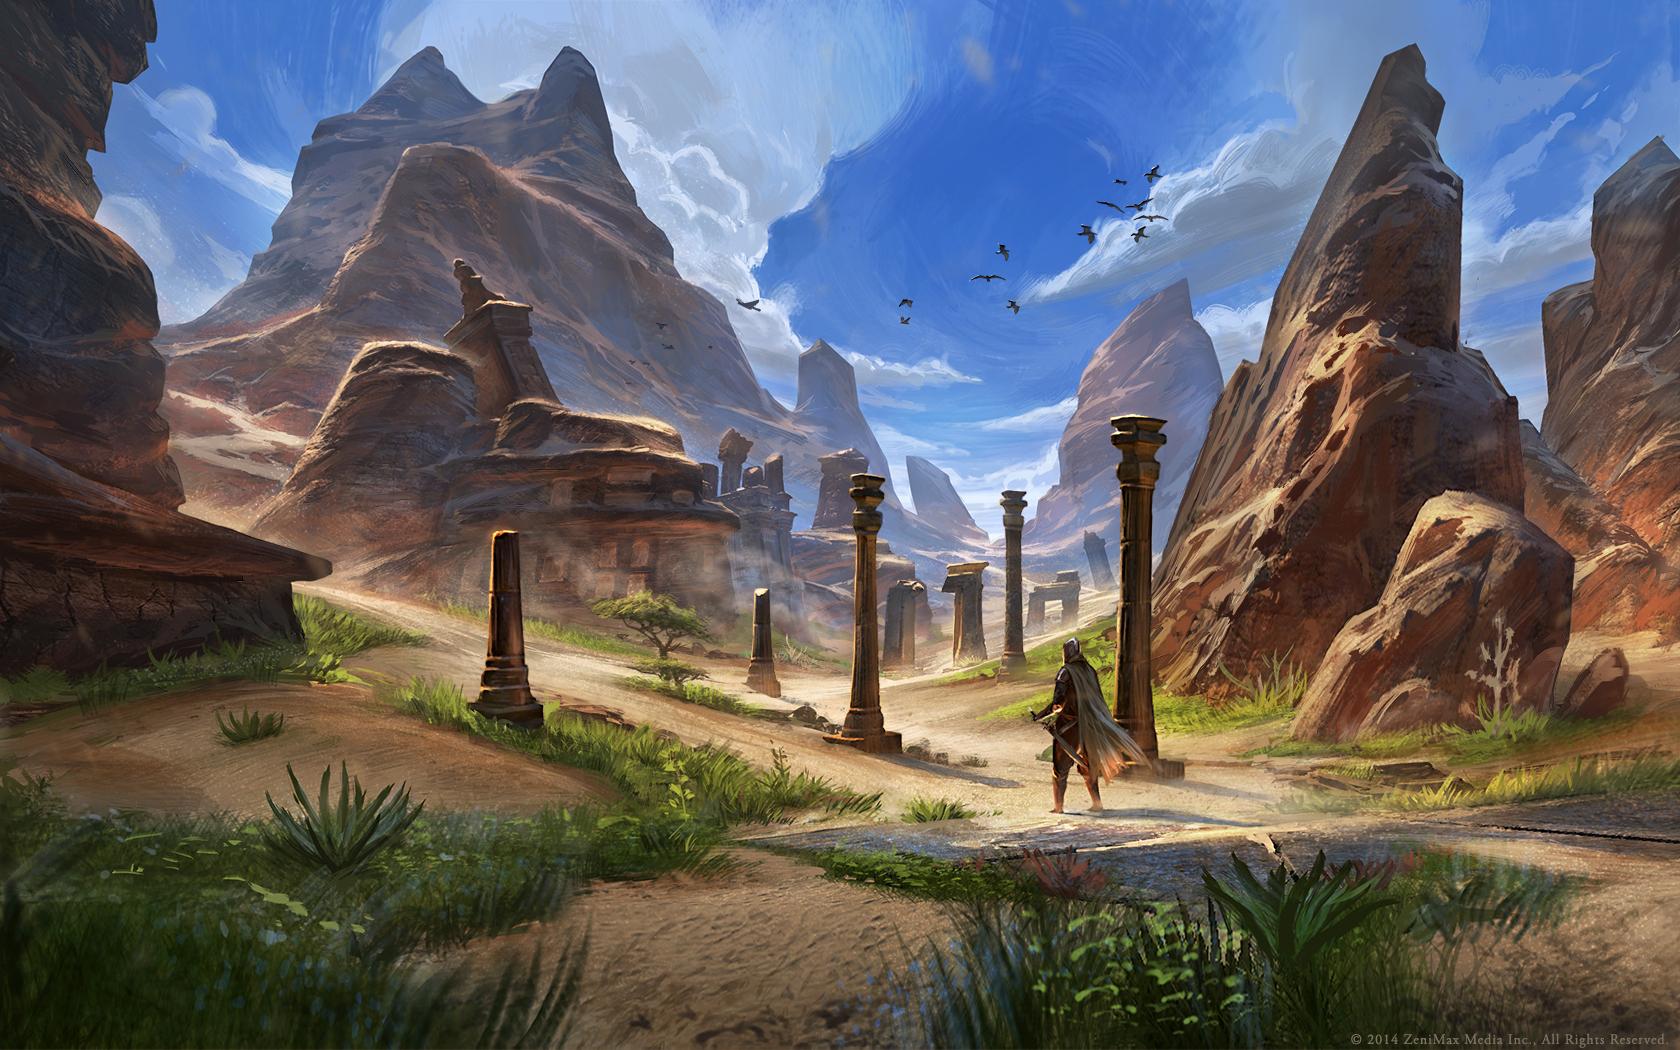 Krásné artworky z Elder Scrolls Online 94968